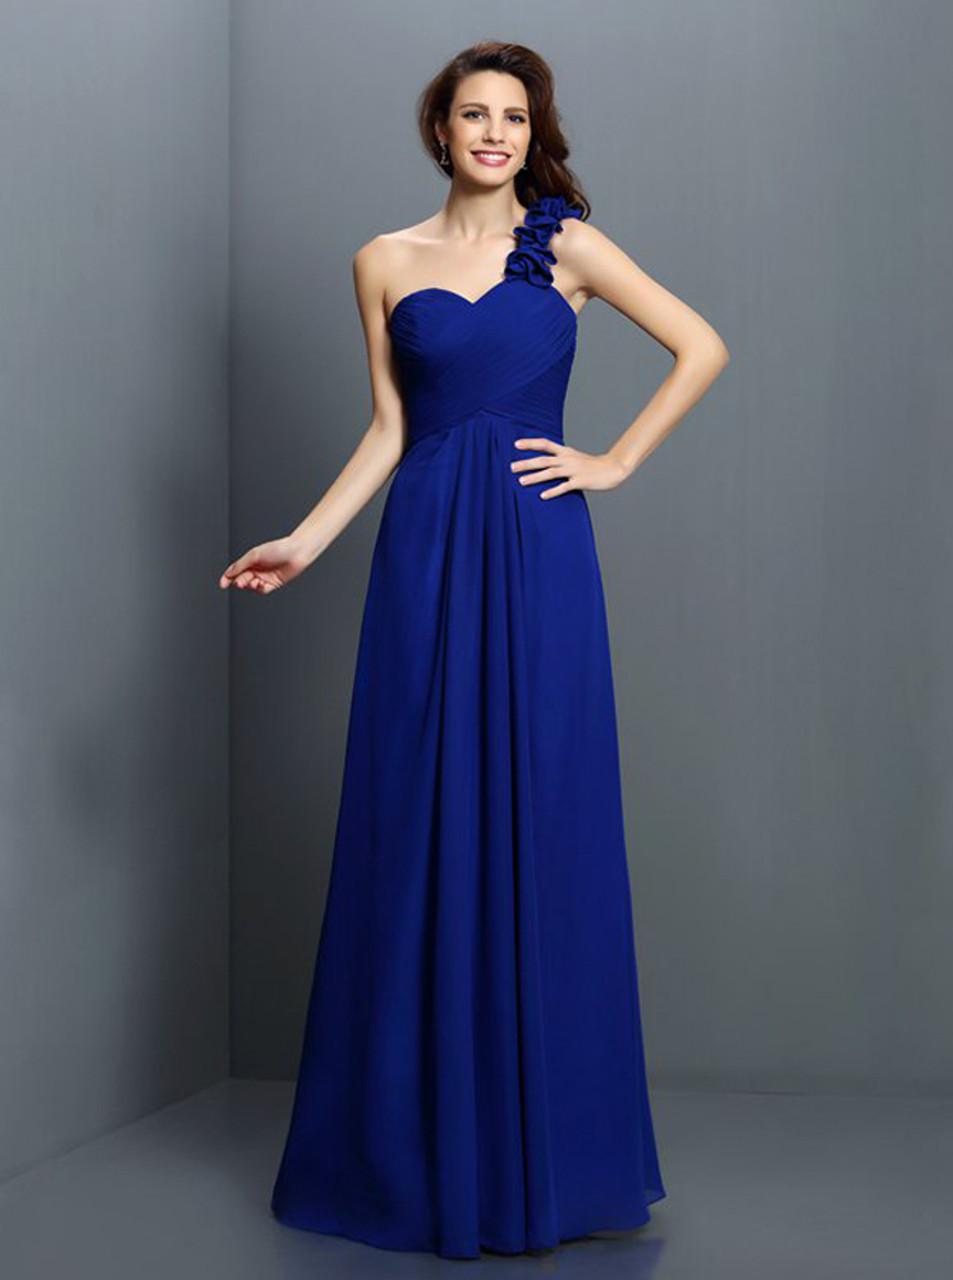 c3c79b3abc6 Simple One Shoulder Bridesmaid Dresses